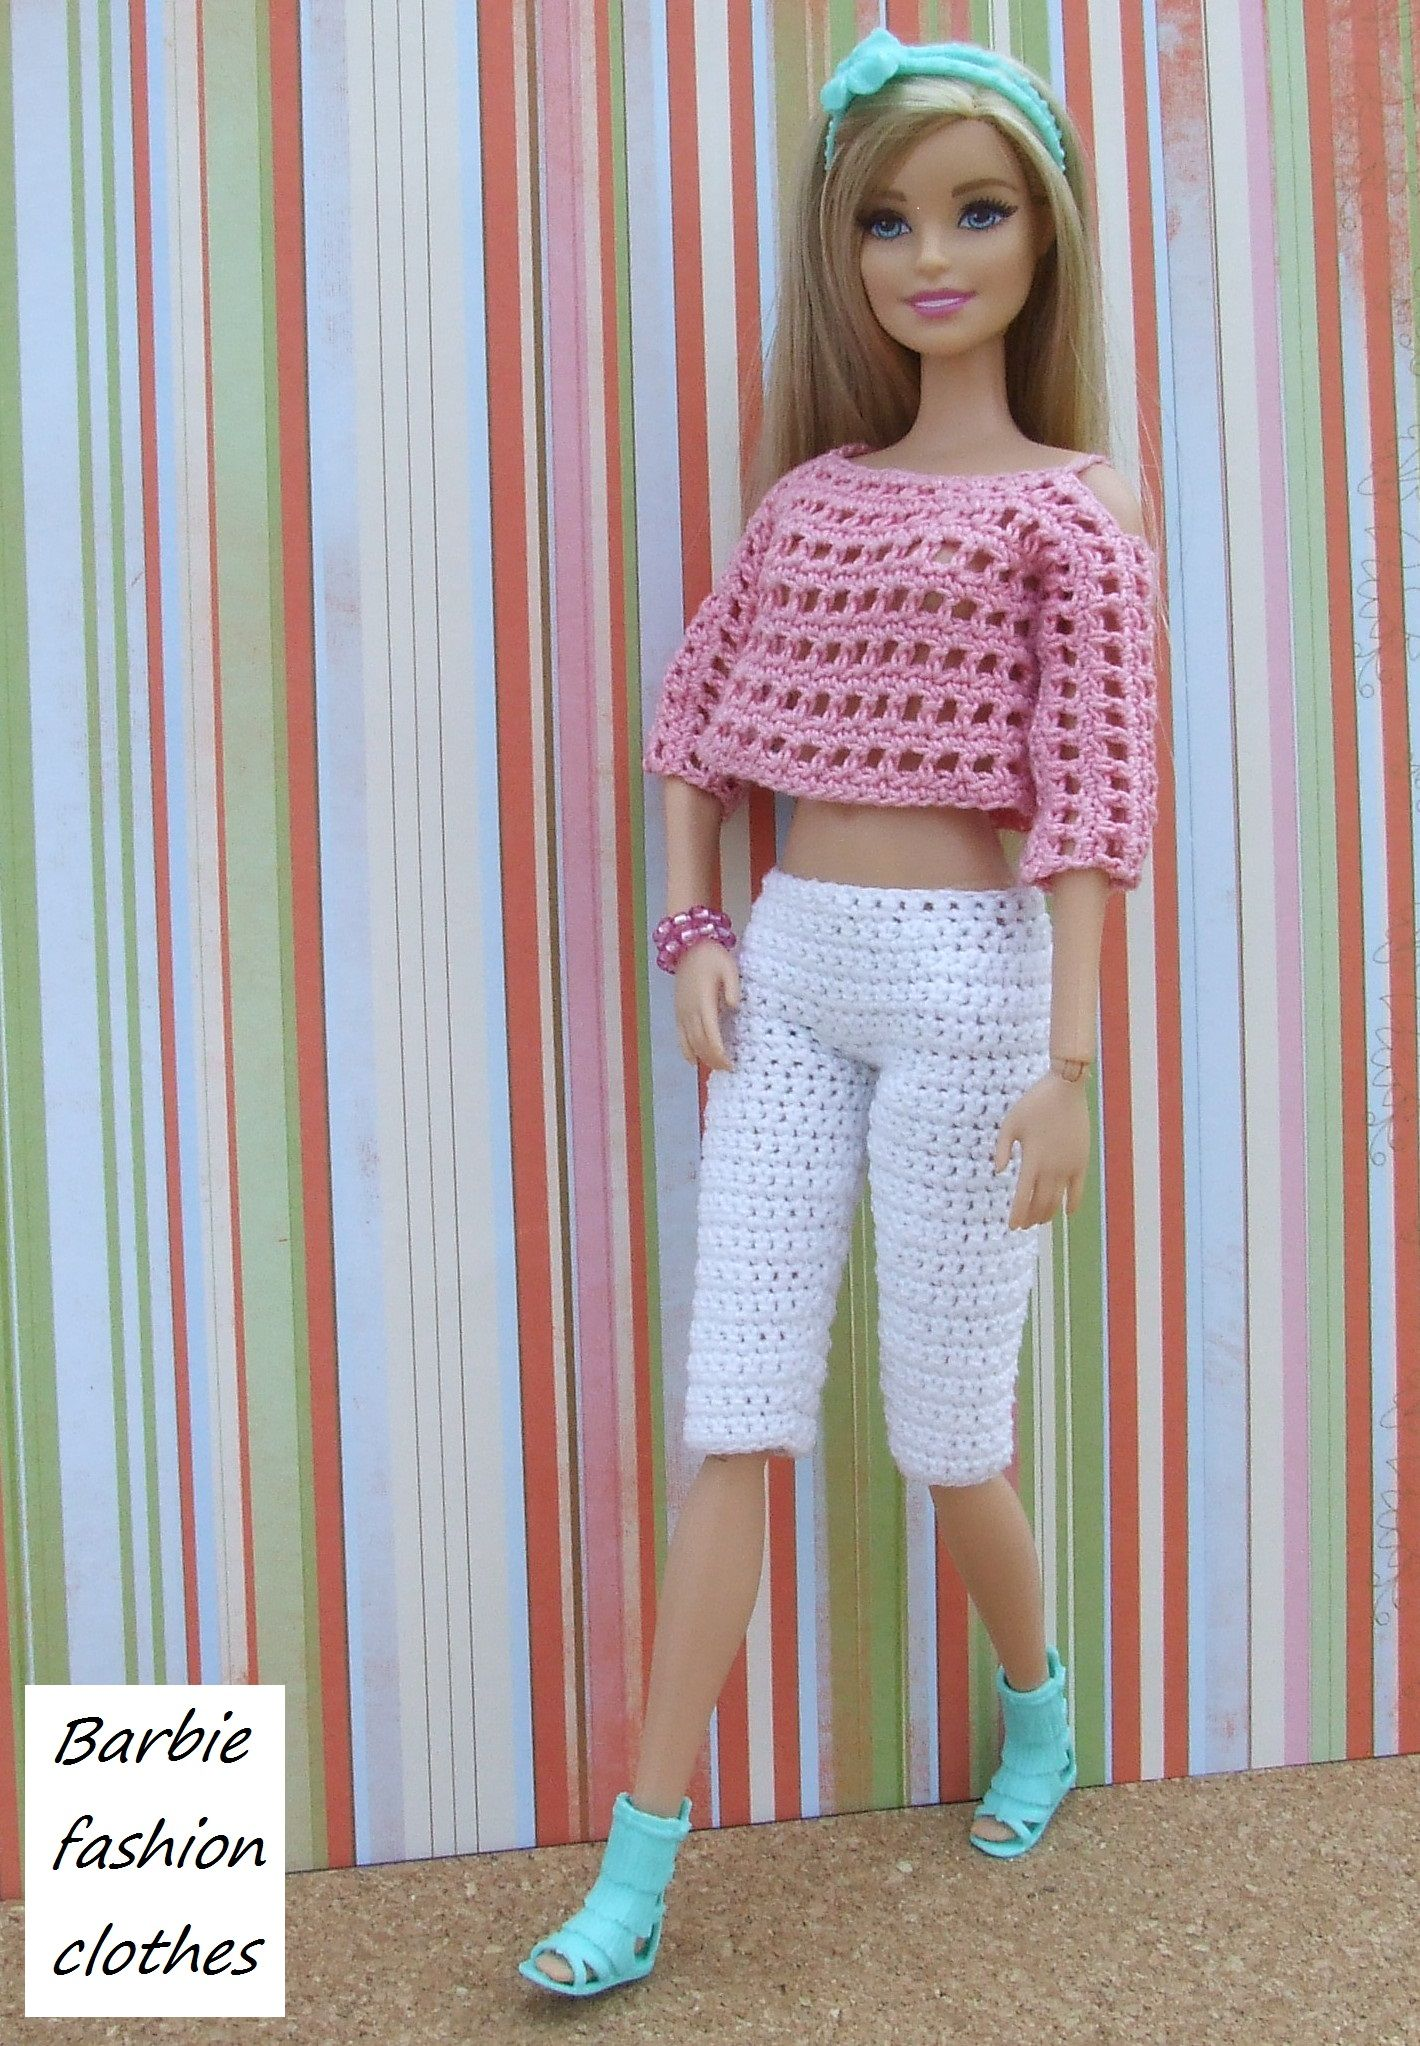 Pin von Anel Lombard auf Barbie fashion clothes | Pinterest